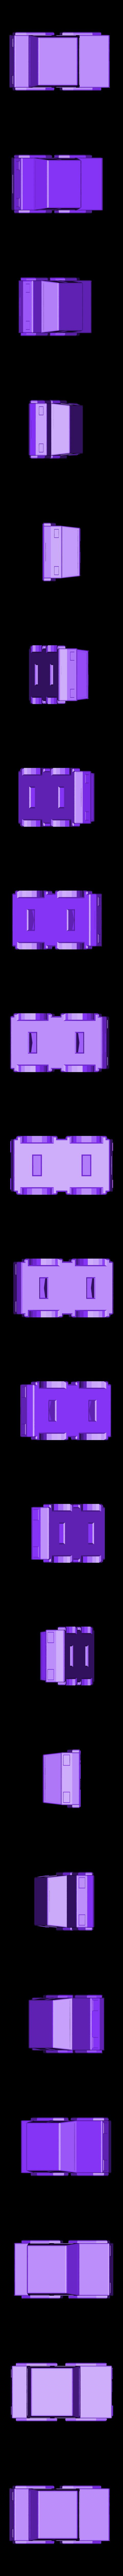 SmallToys-BodyCar4.stl Download STL file SmallToys - Cars pack • 3D print design, Wabby